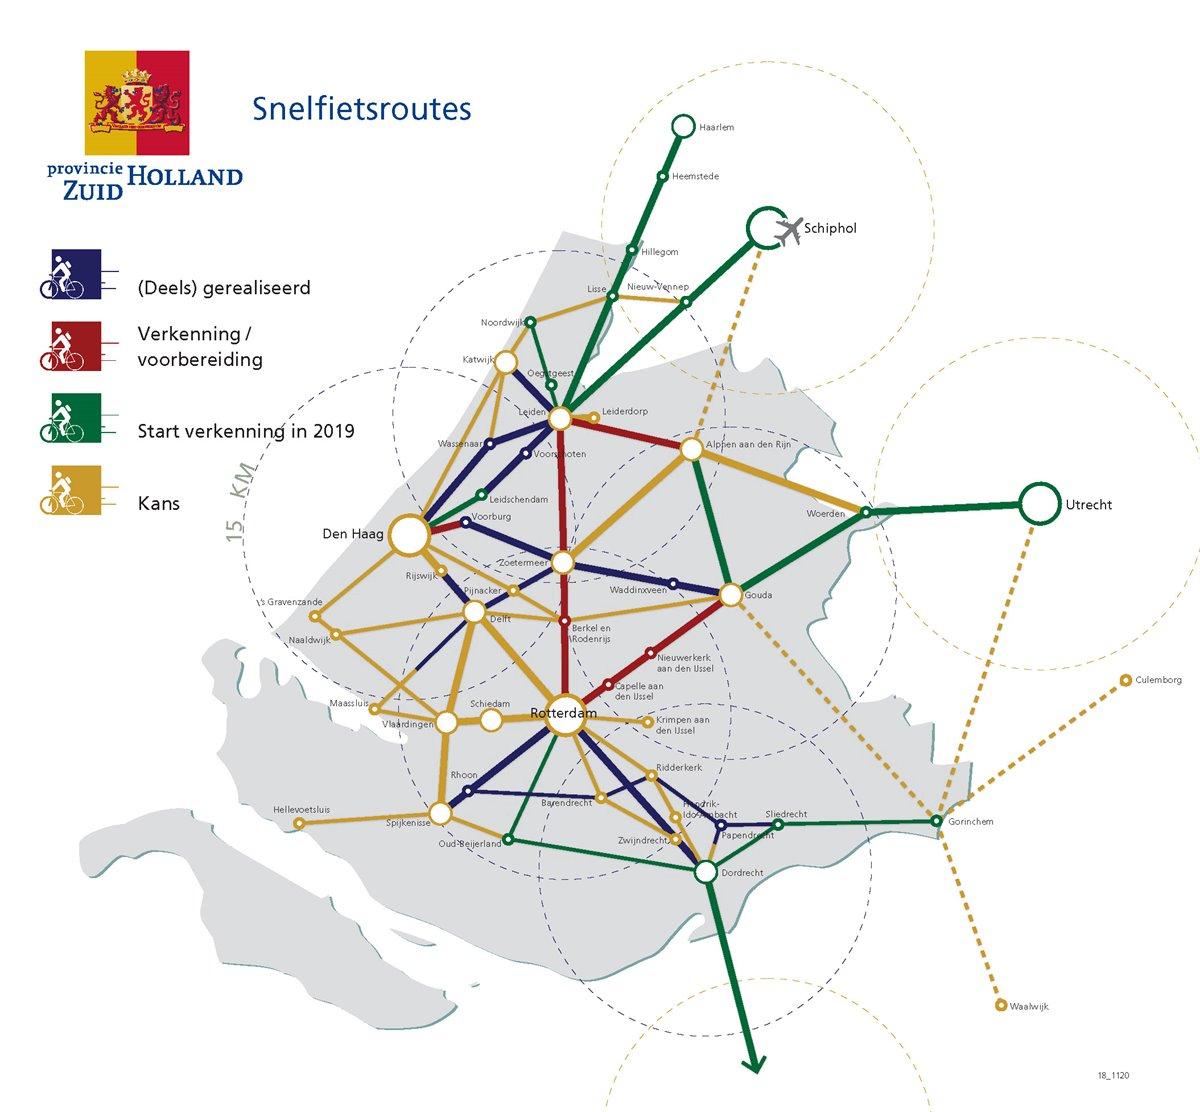 Snelfietsnetwerk Zui-Holland